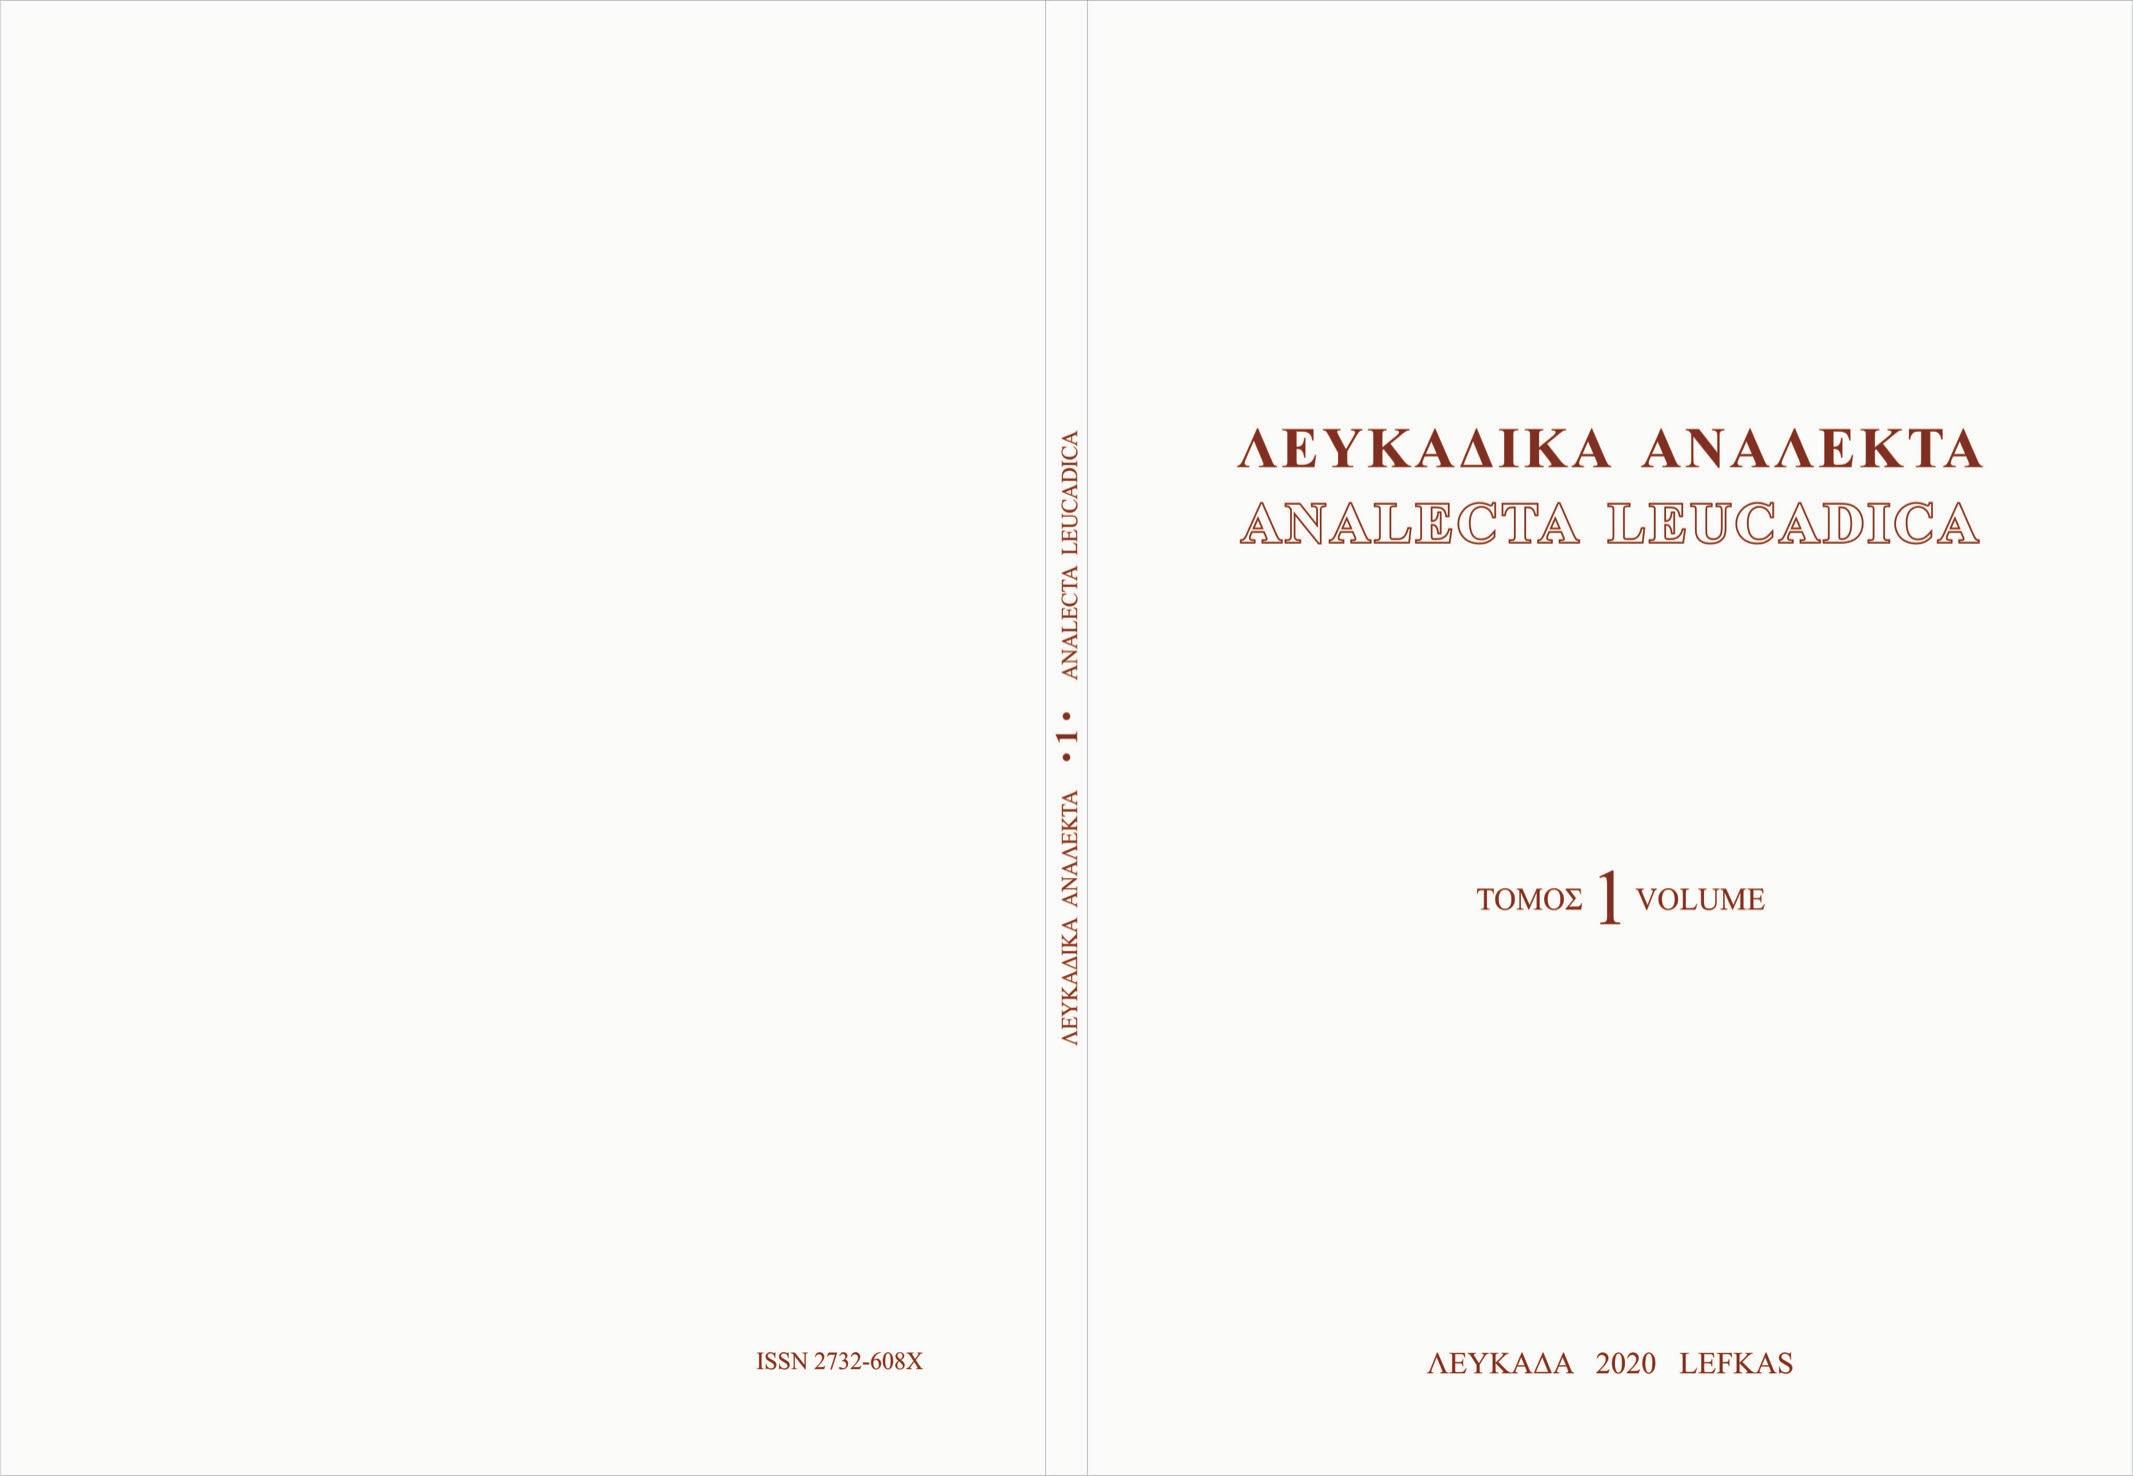 Lefkadika_Analekta